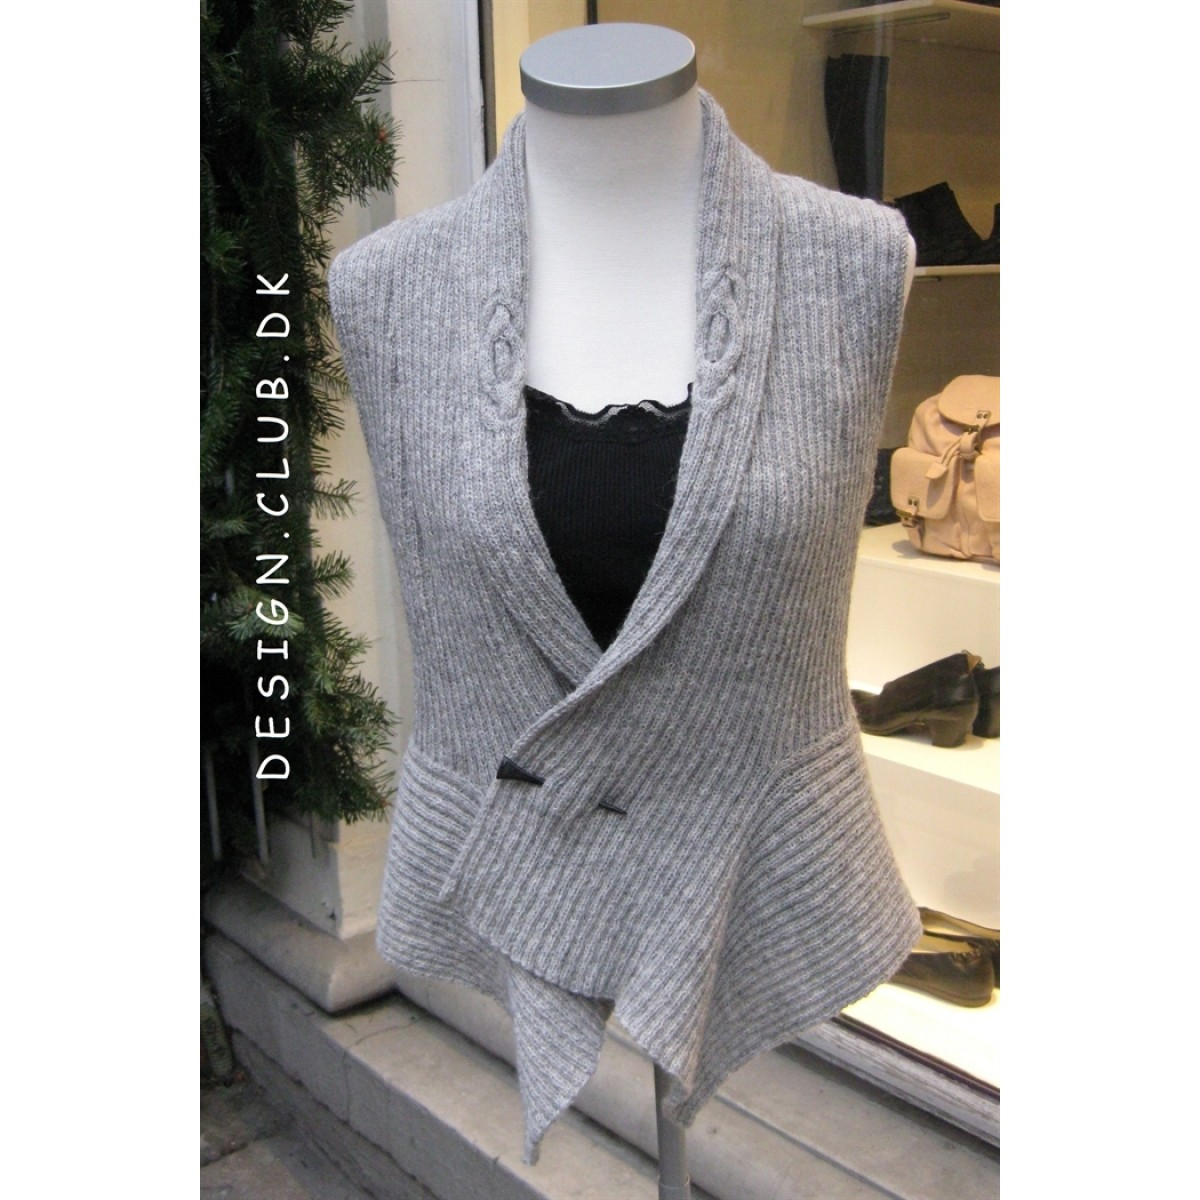 Elses vest